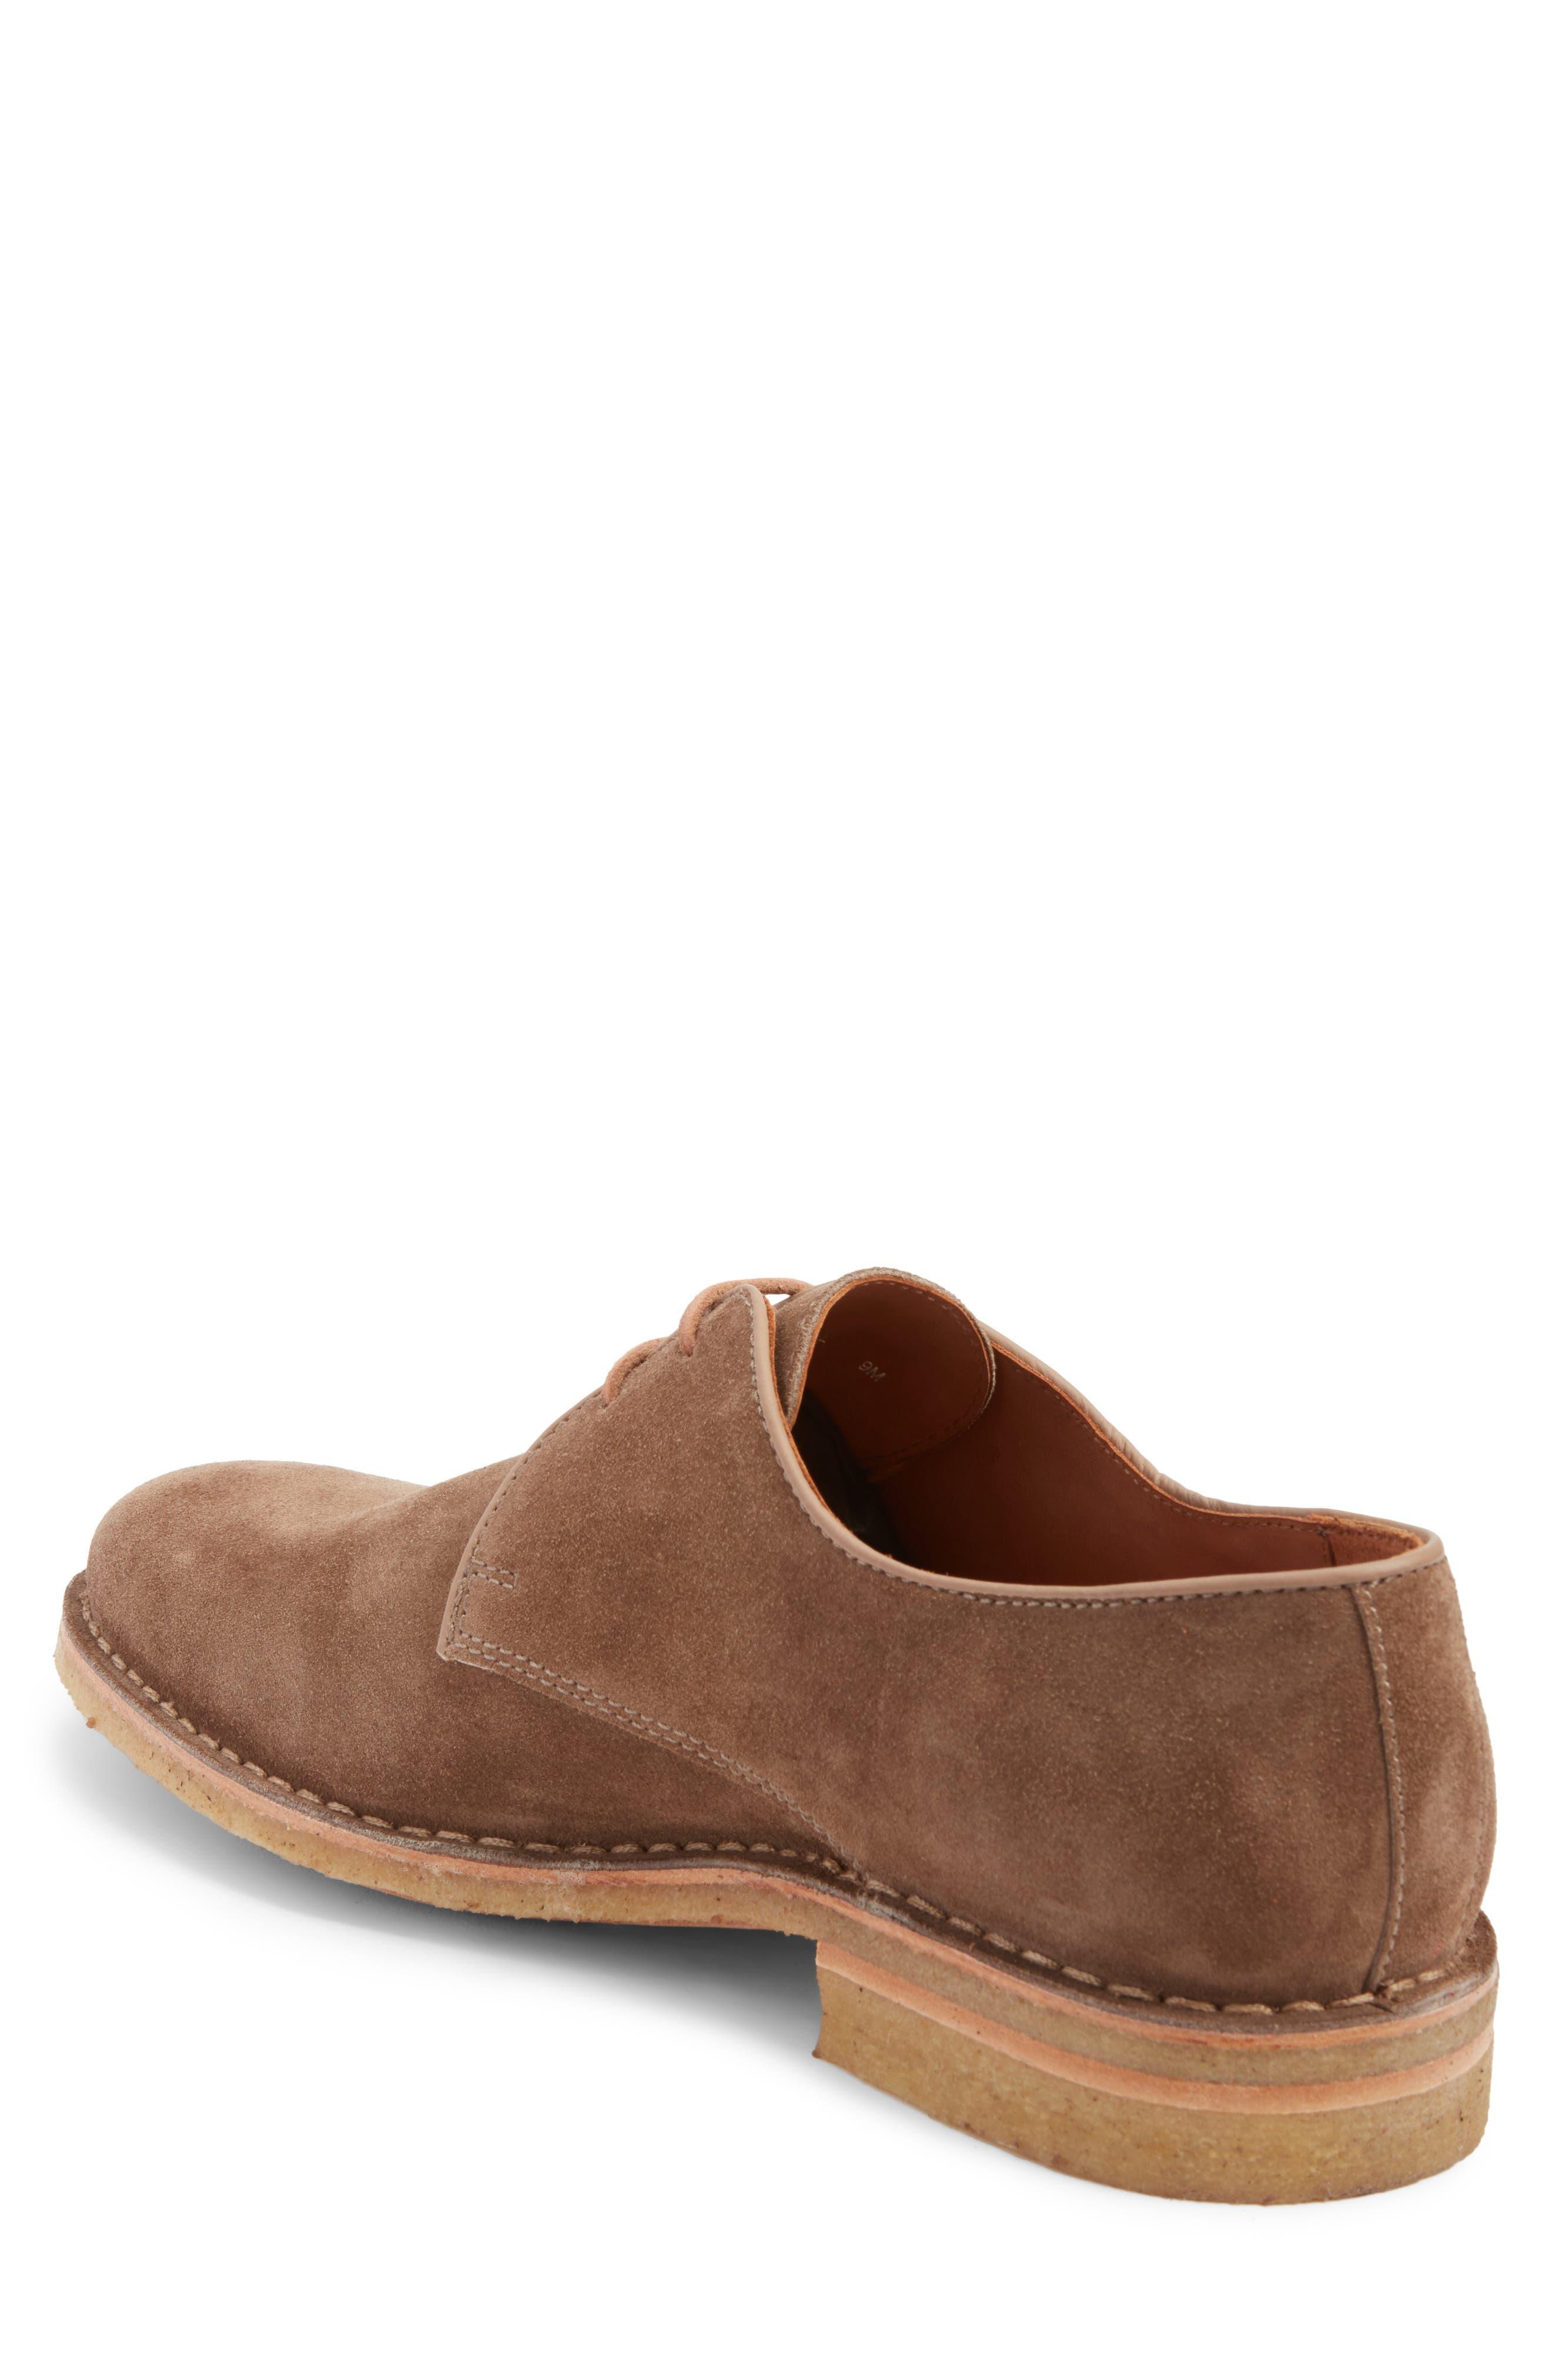 Otis Buck Shoe,                             Alternate thumbnail 2, color,                             250